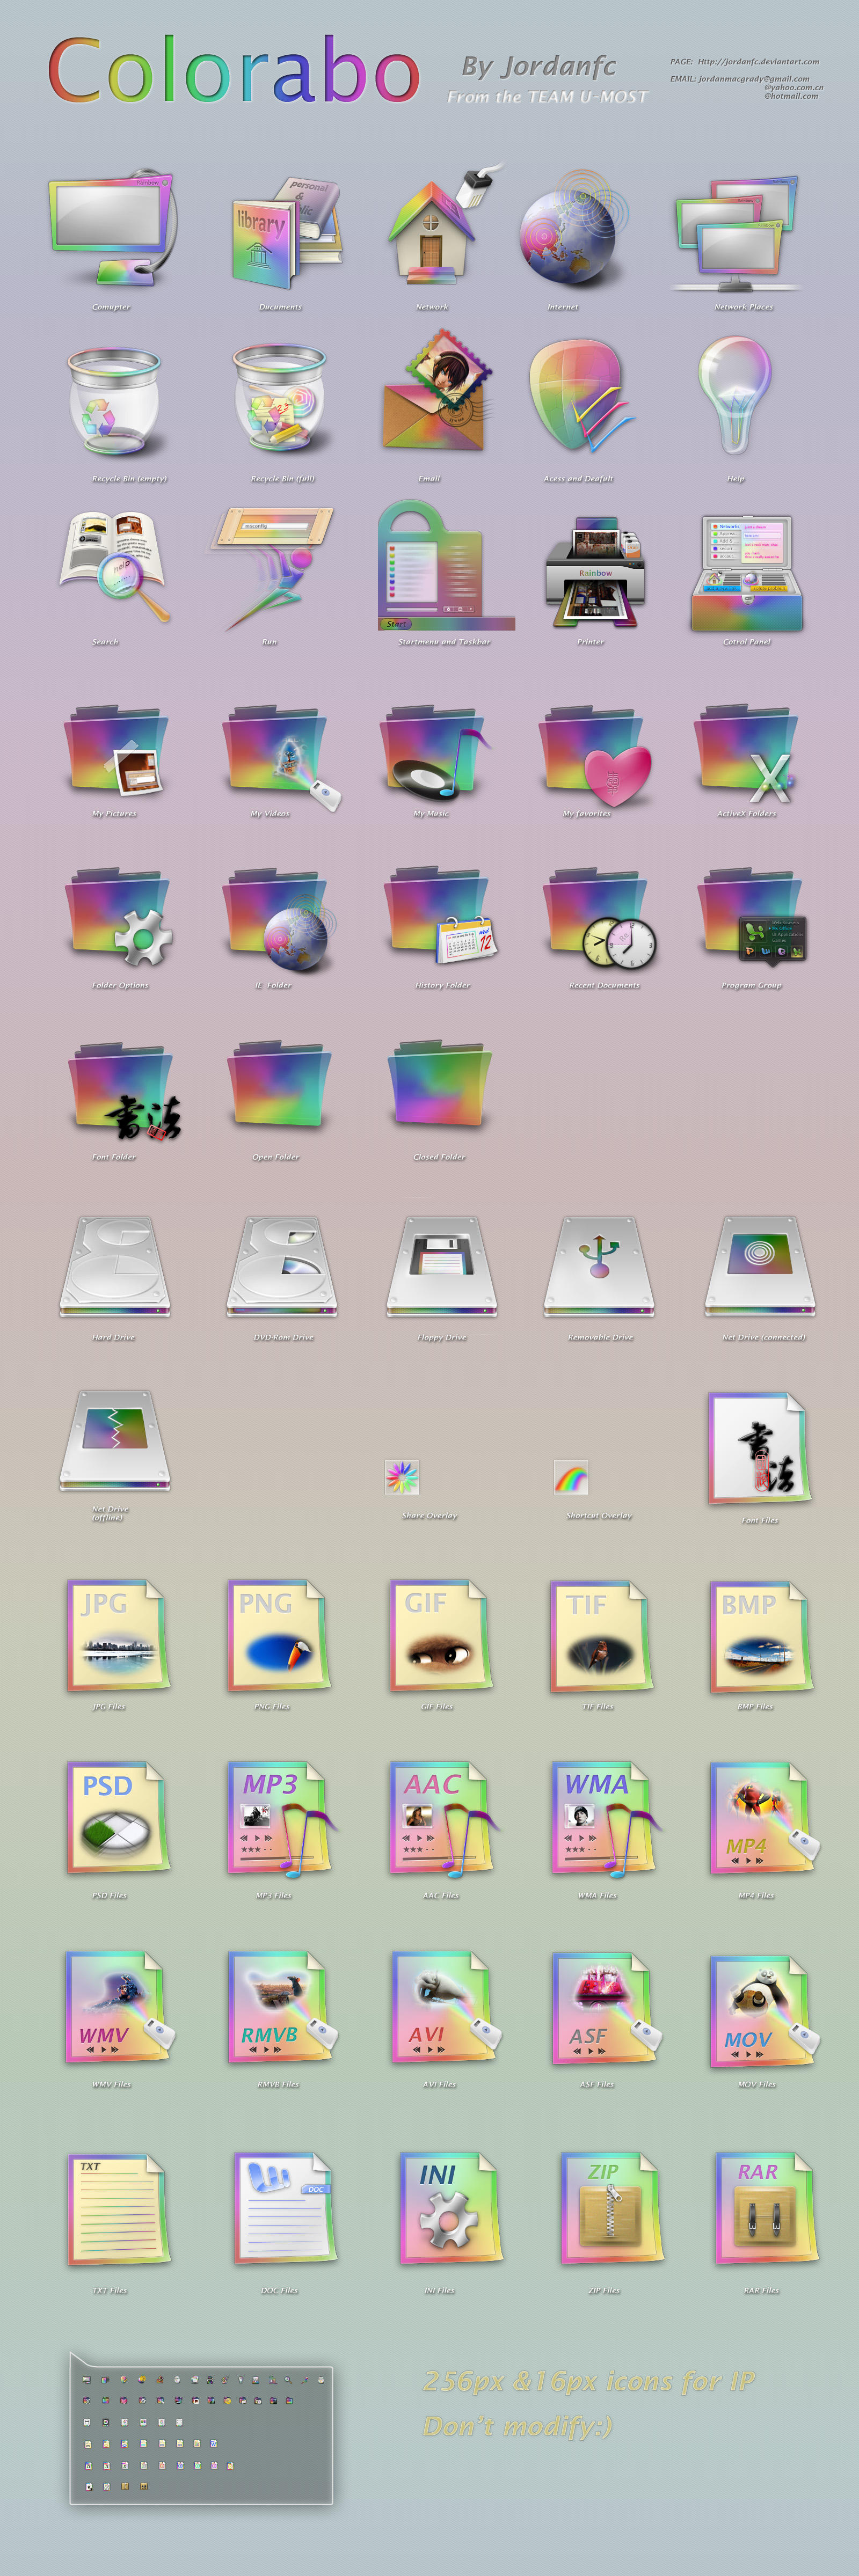 colorabo png files by jordanfc